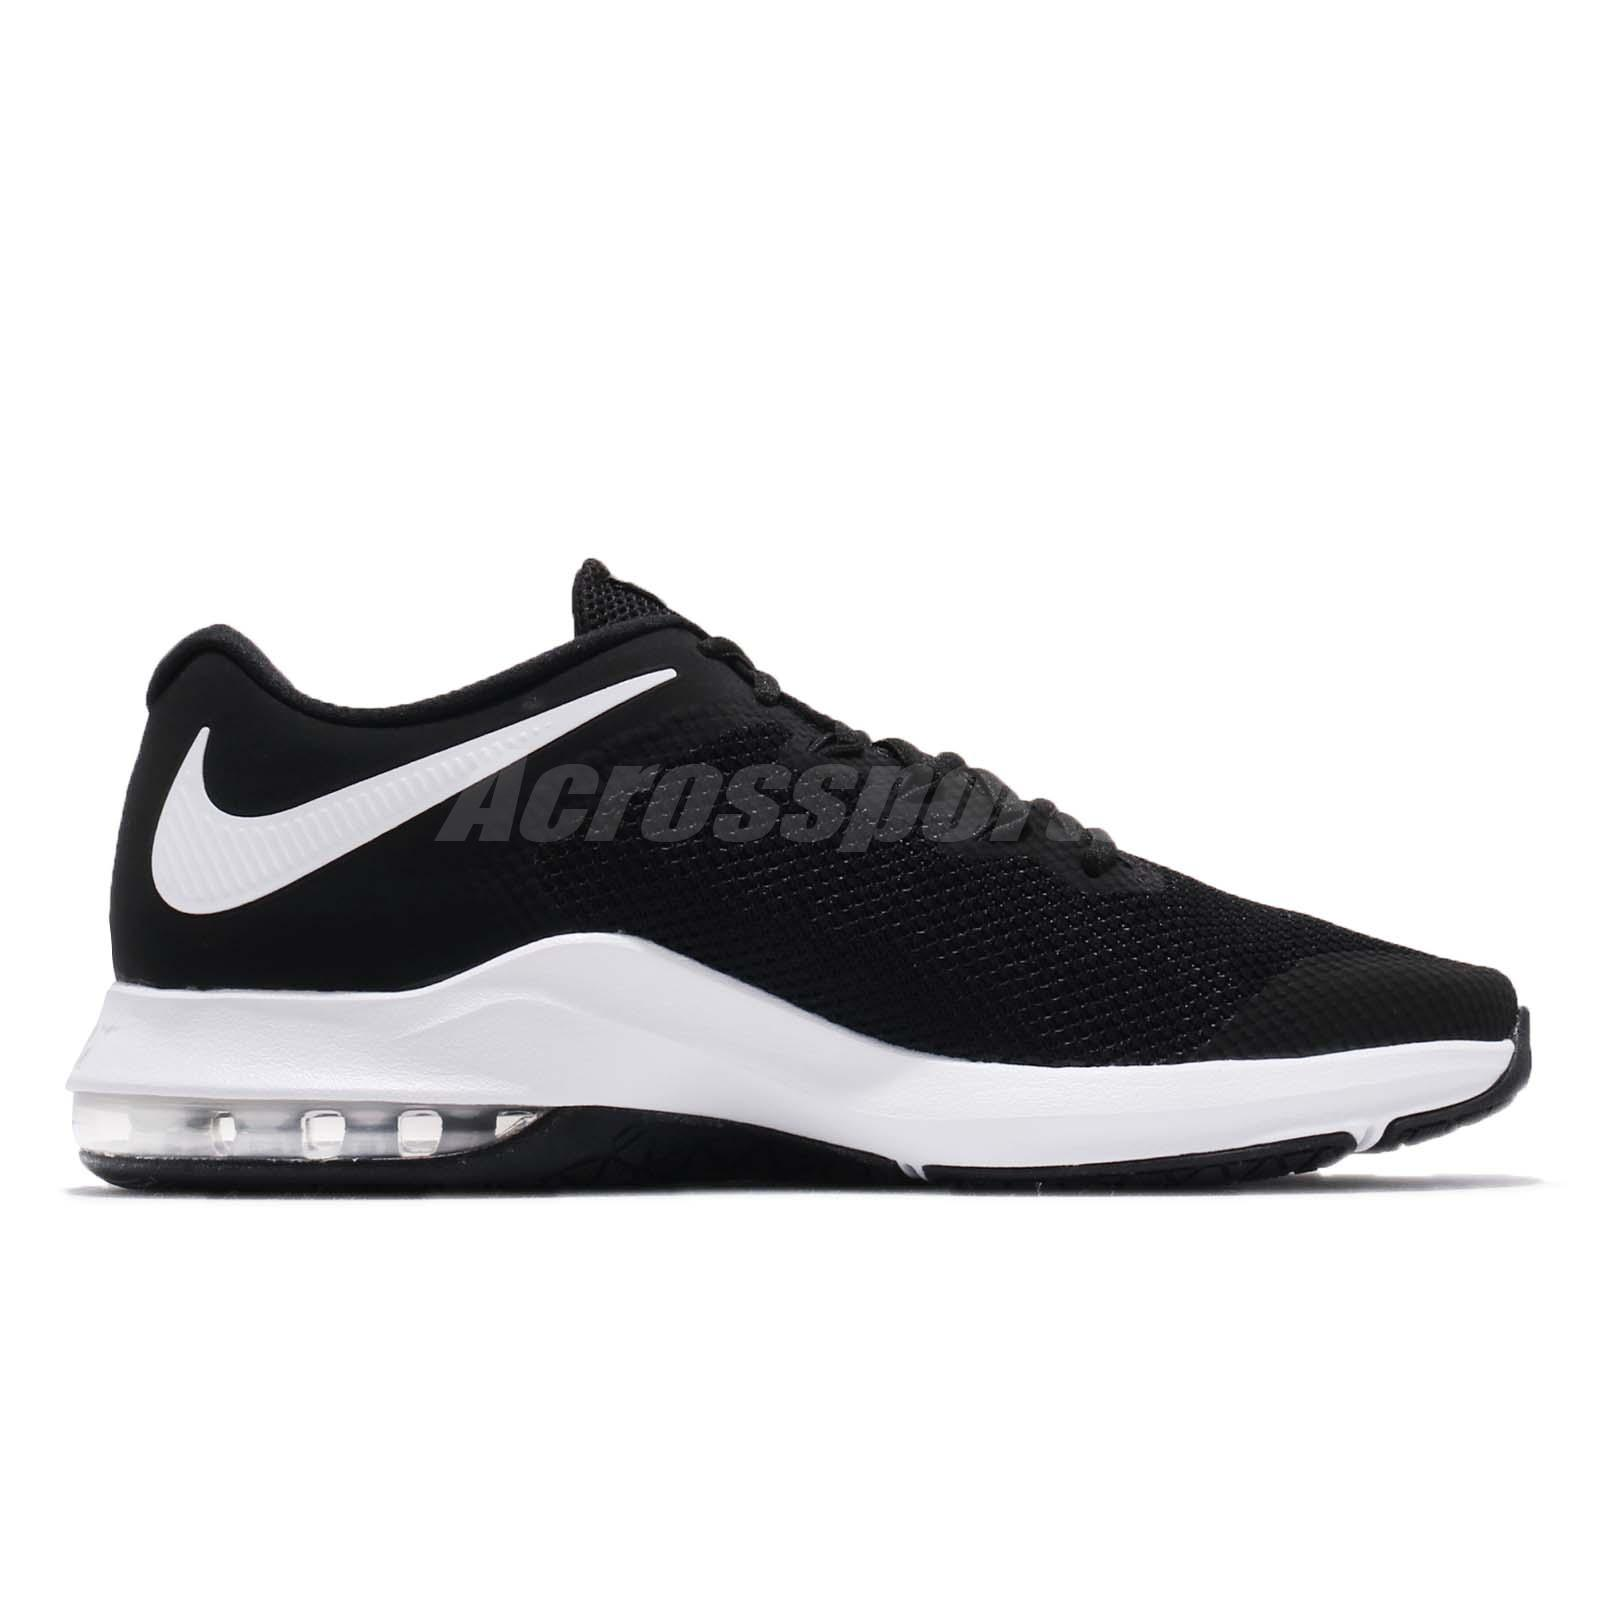 454771db17c Nike Air Max Alpha Trainer Black White Men Cross Training Shoes ...